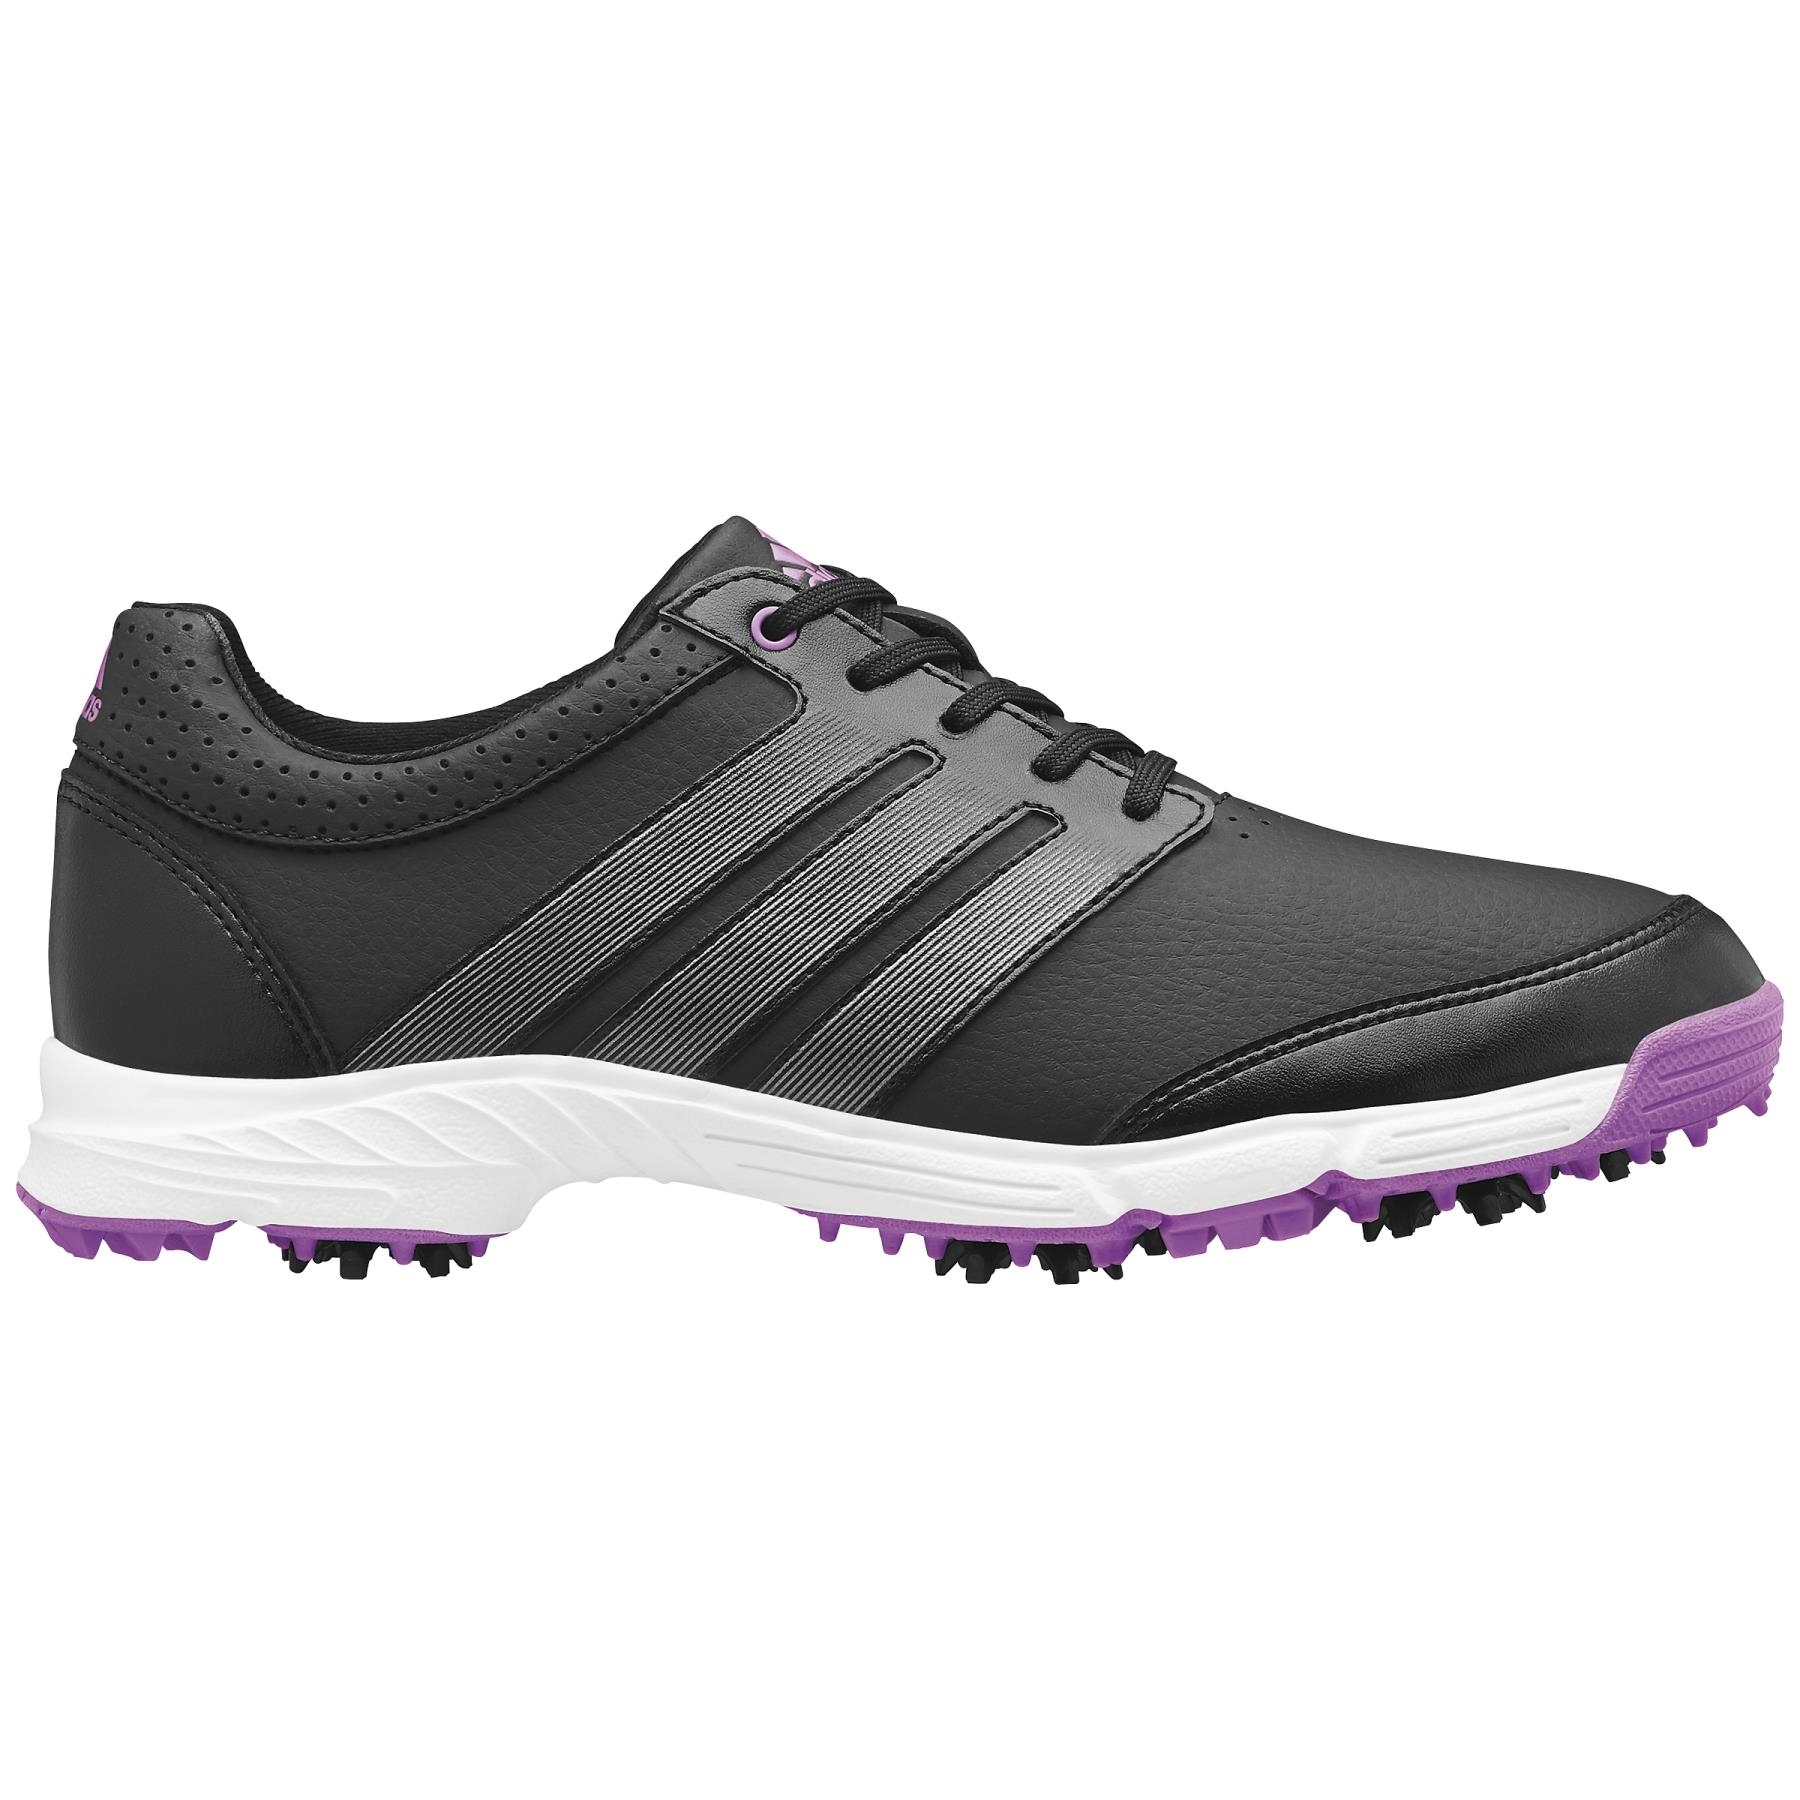 Zapatos de Golf Para Mujer Adidas Response Light